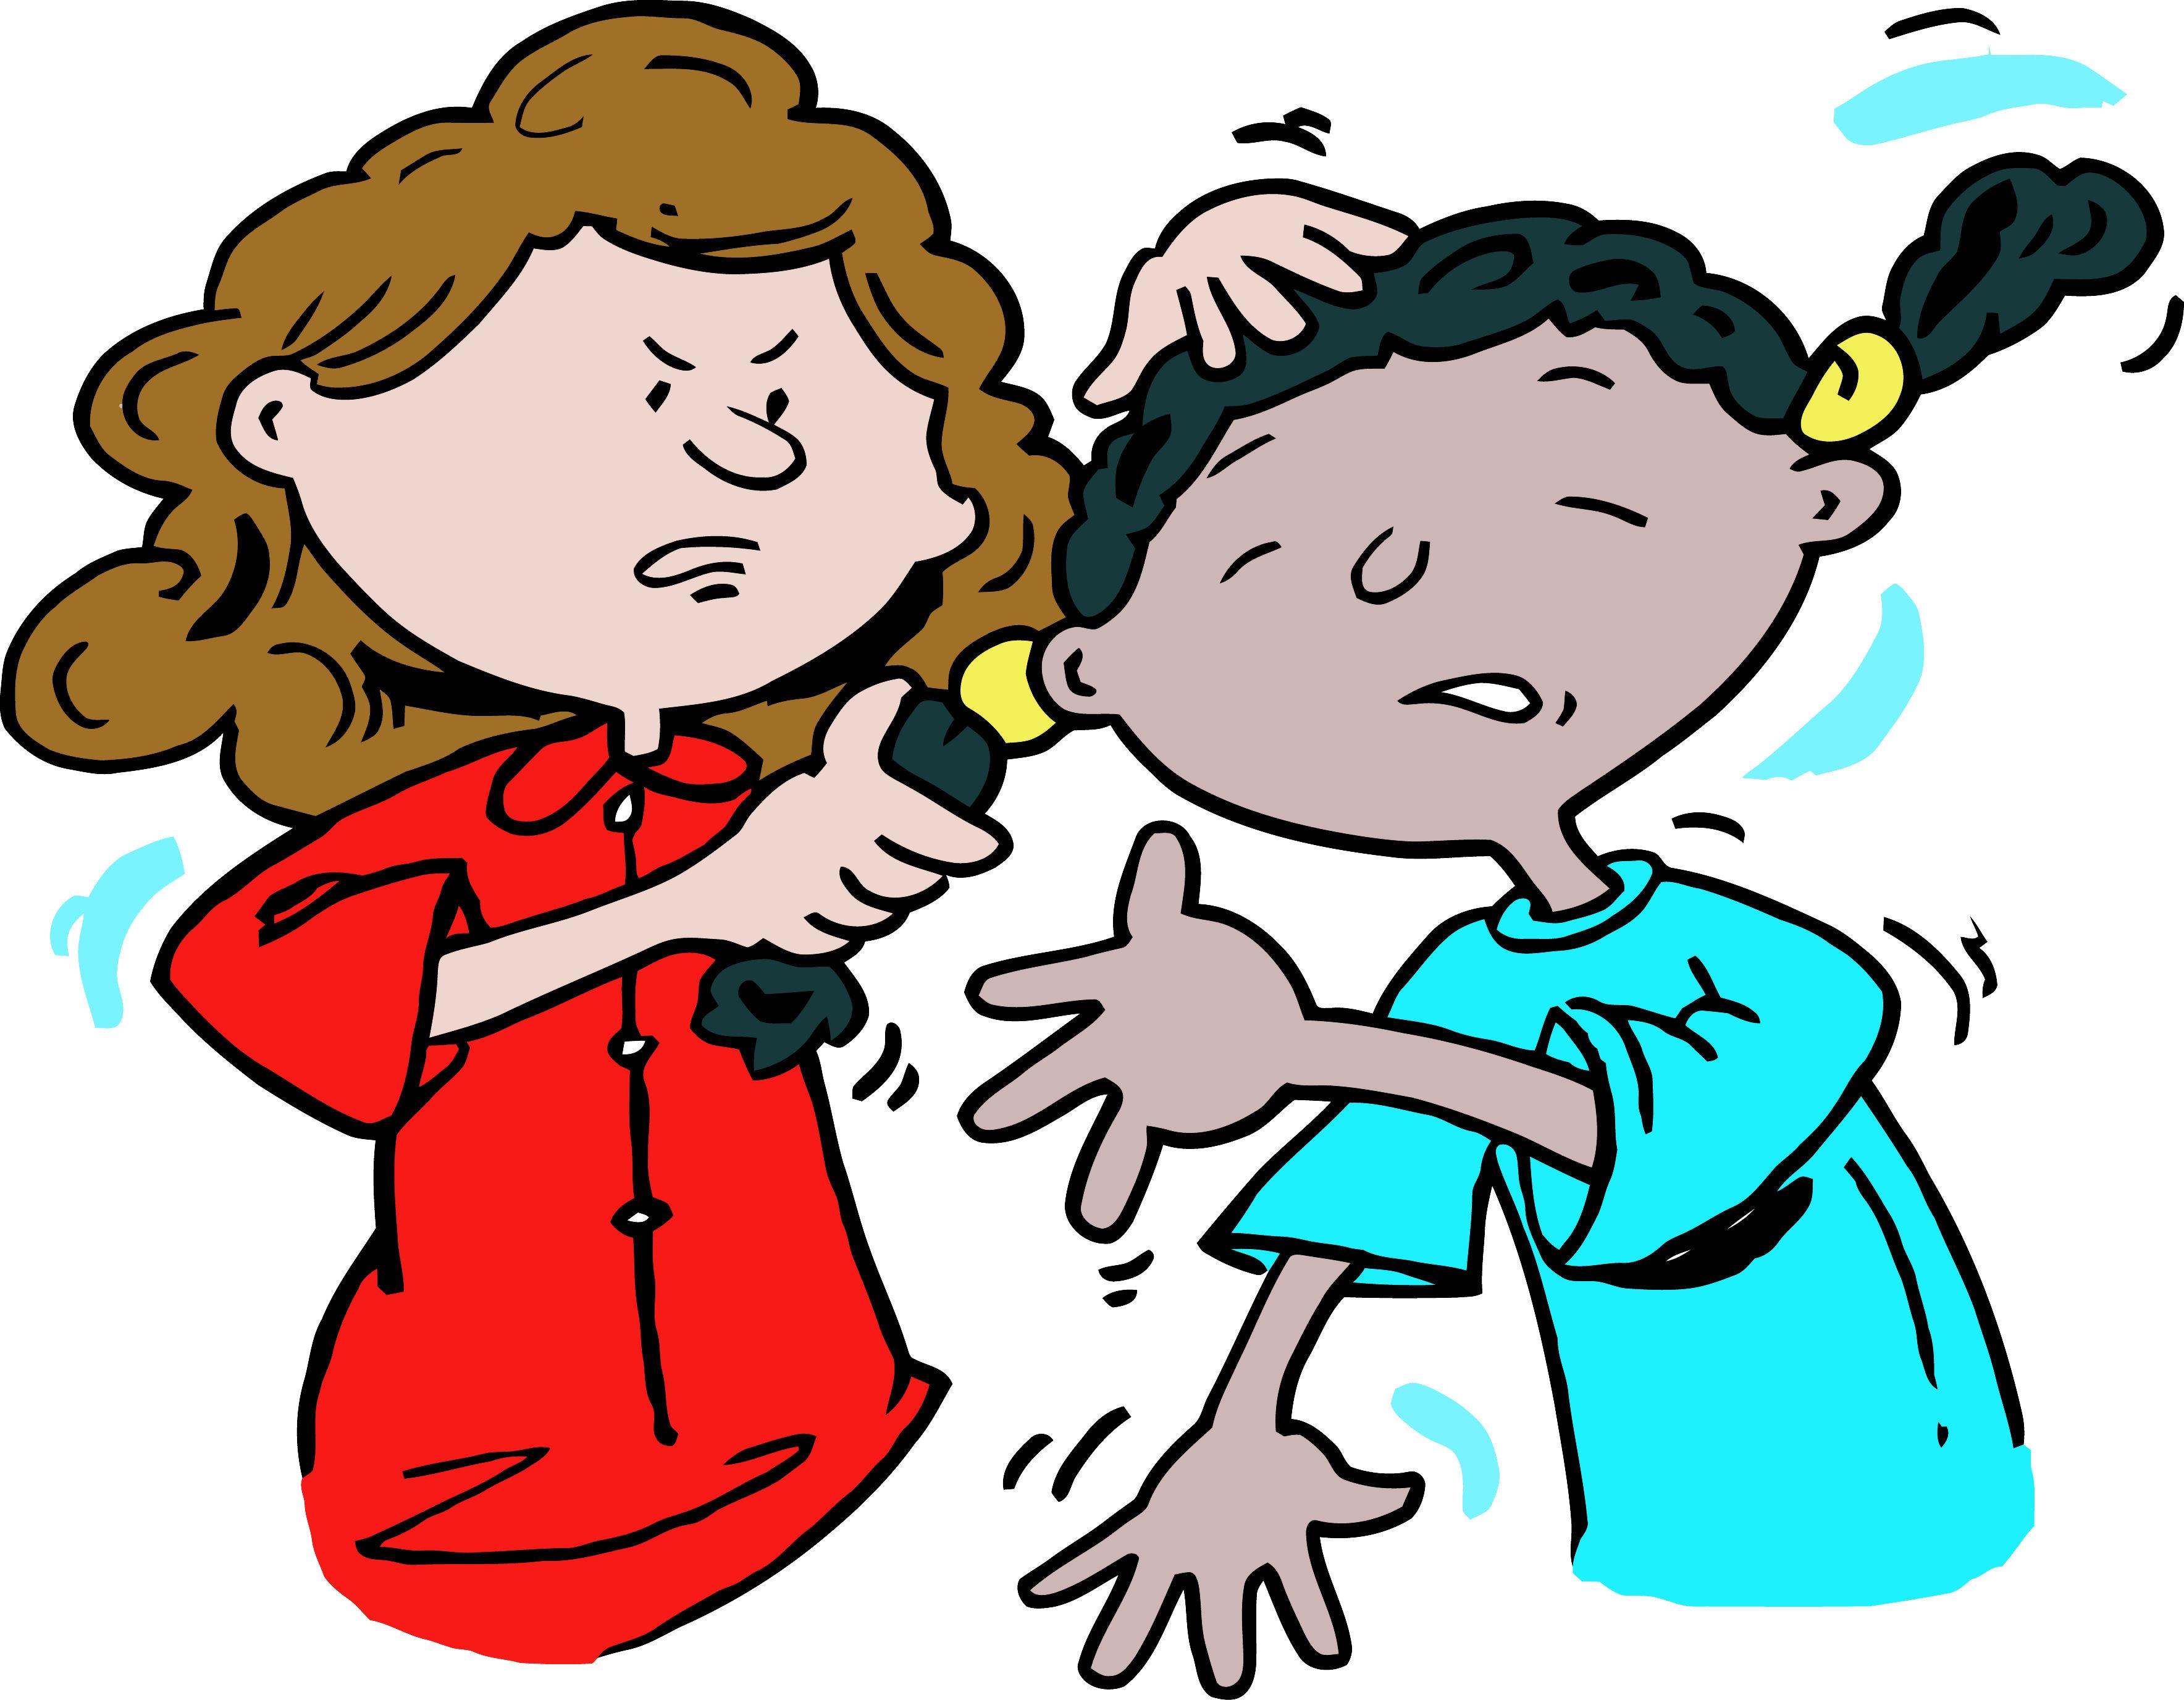 Physical Bullying Clip Art N2 free image.